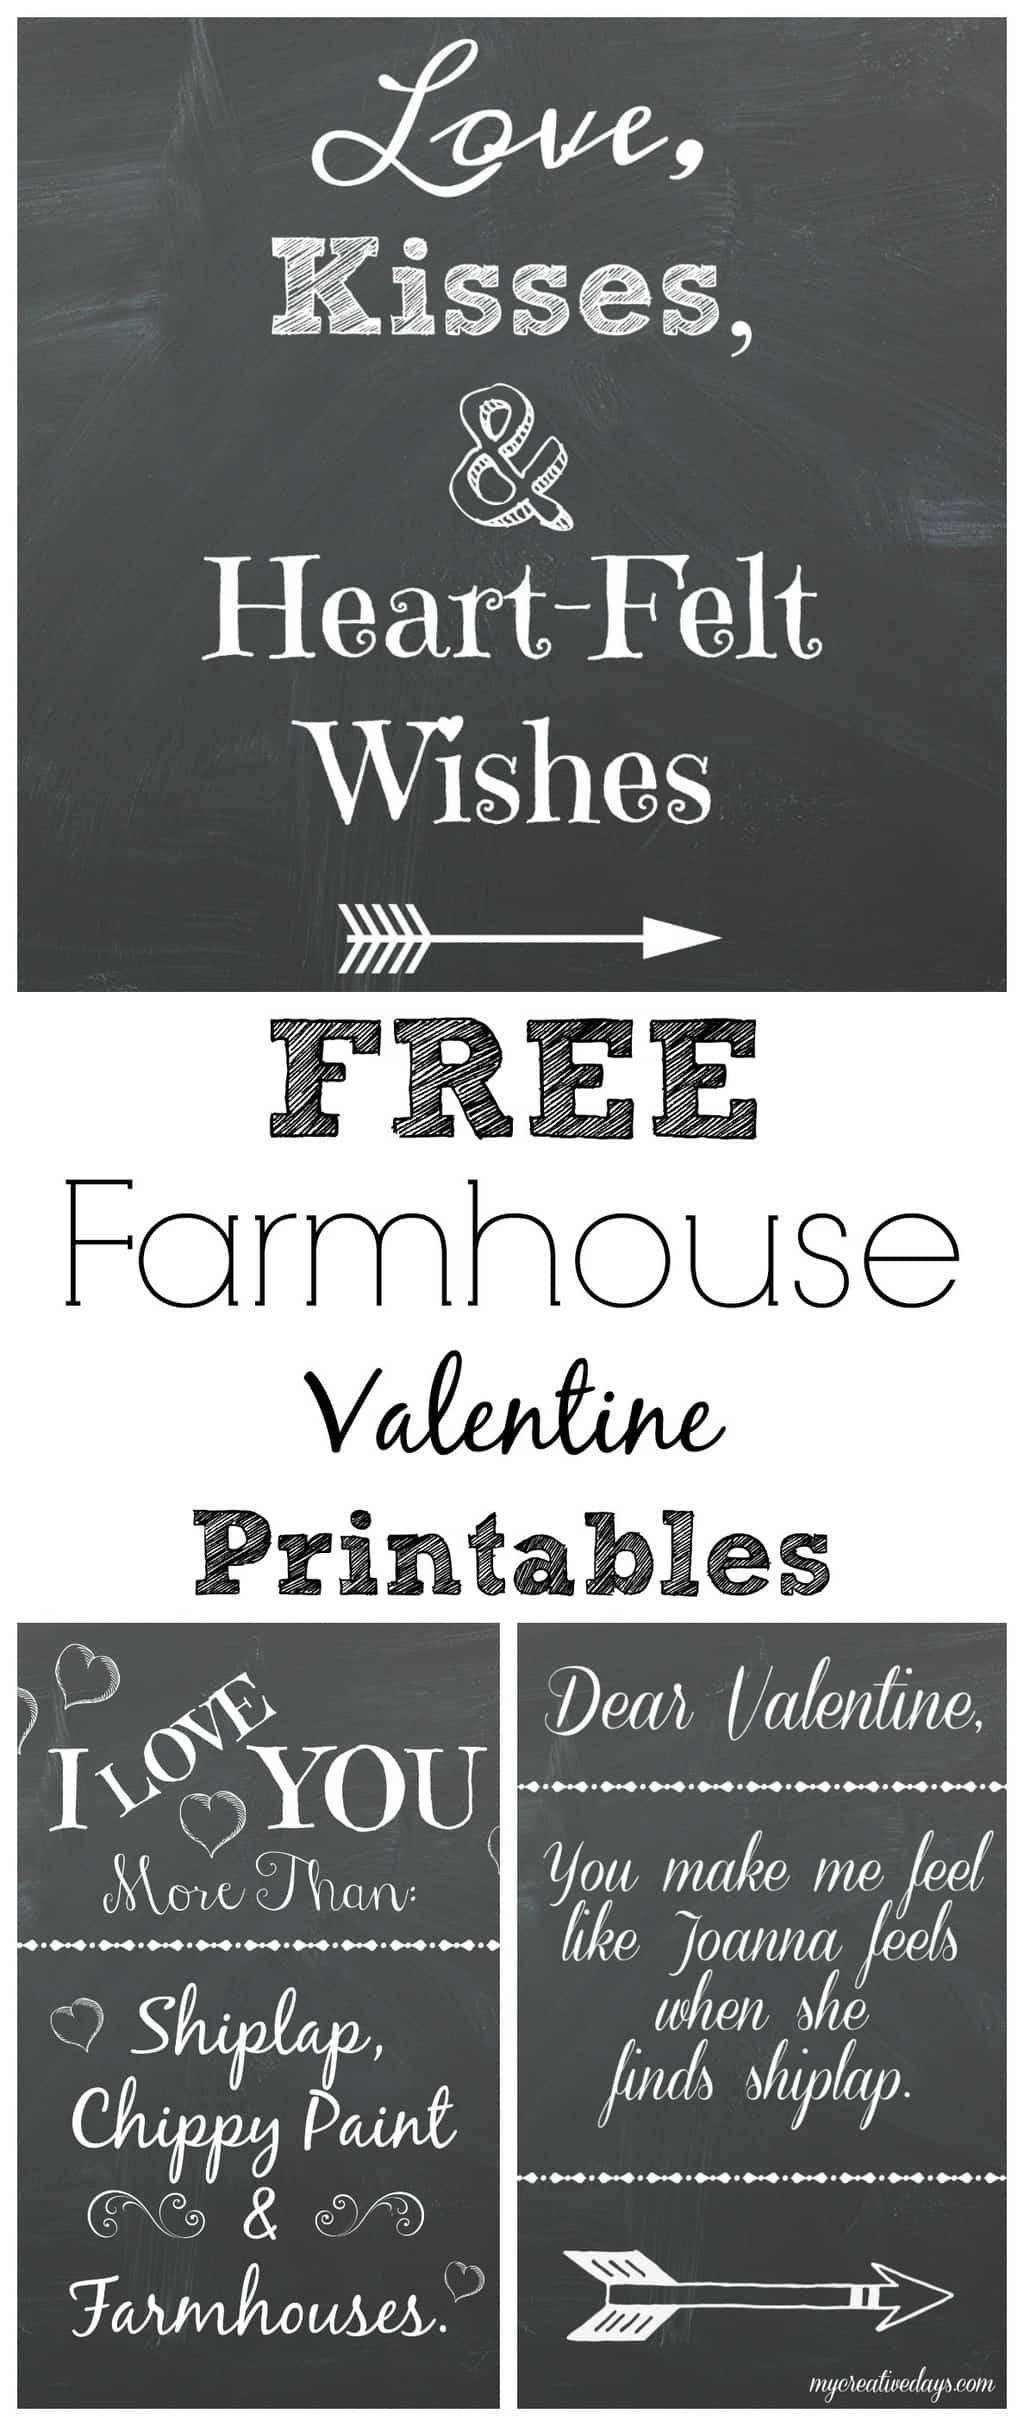 Valentine Printables With A Farmhouse Vibe My Creative Days